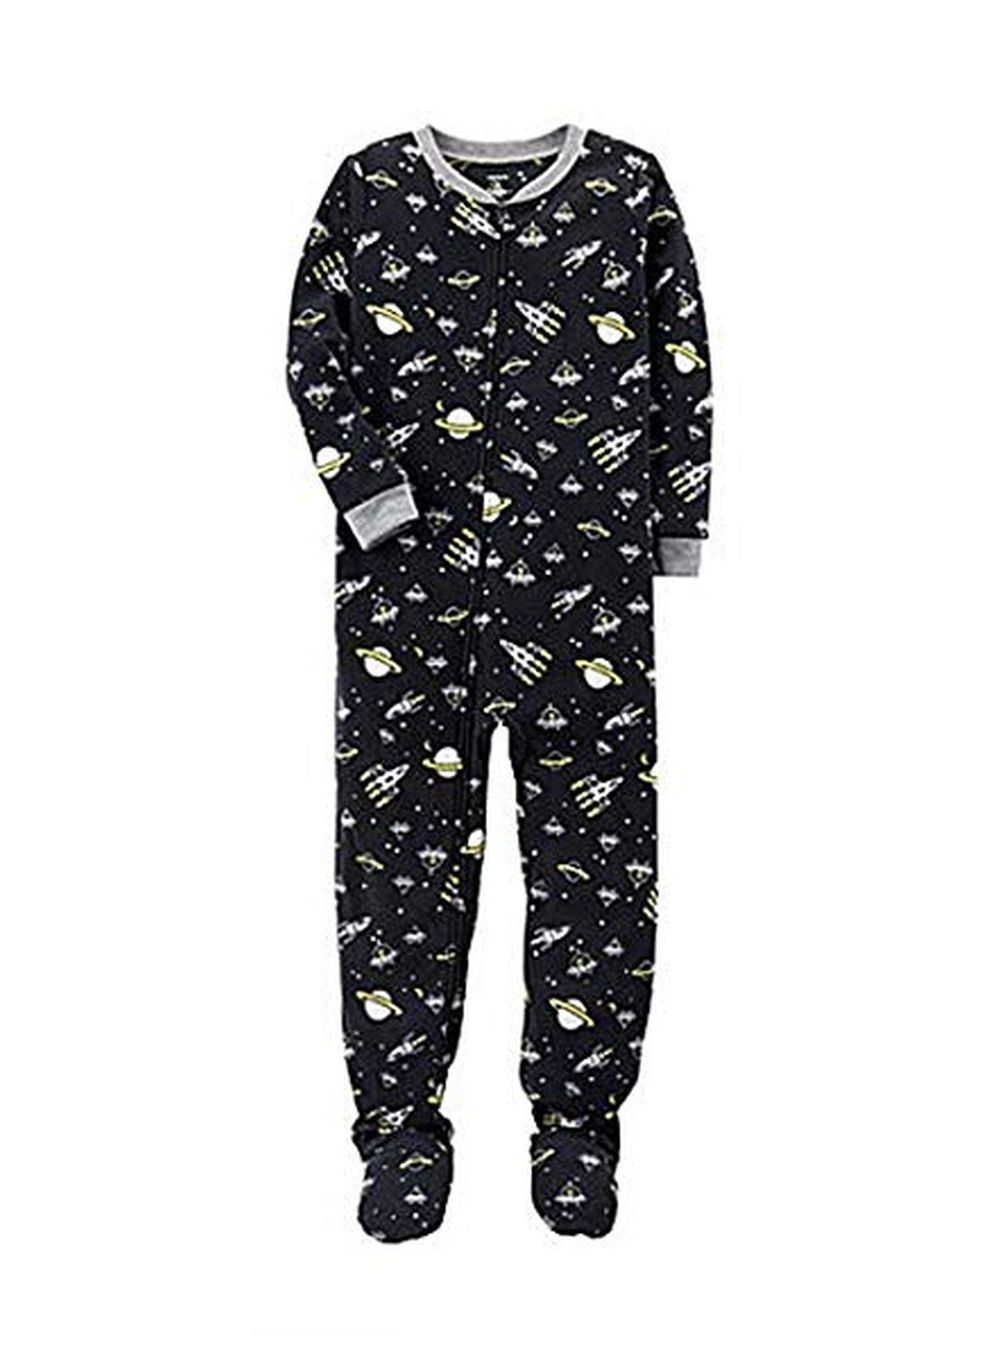 cf1a95aafe37 CARTER S BOY S SPACE Alien Spaceships Fleece Footed Pajama Sleeper ...